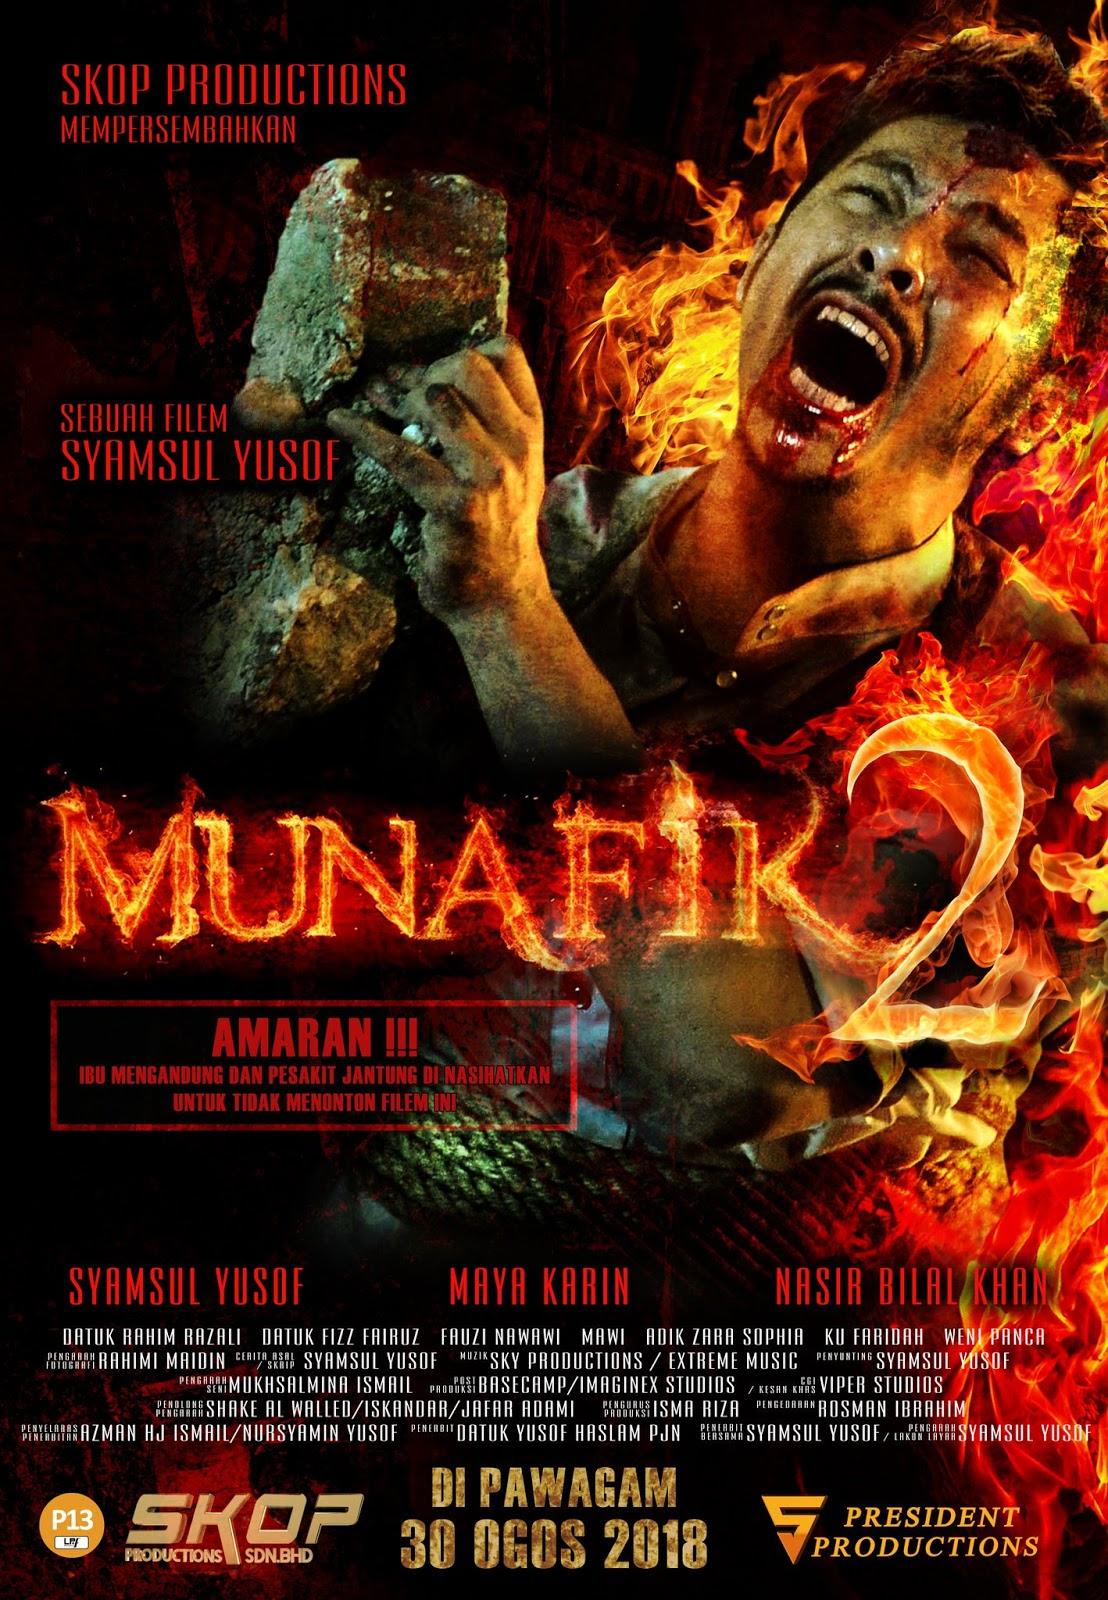 Nonton Film Streaming Movie Layarkaca21 Lk21 Dunia21 ...